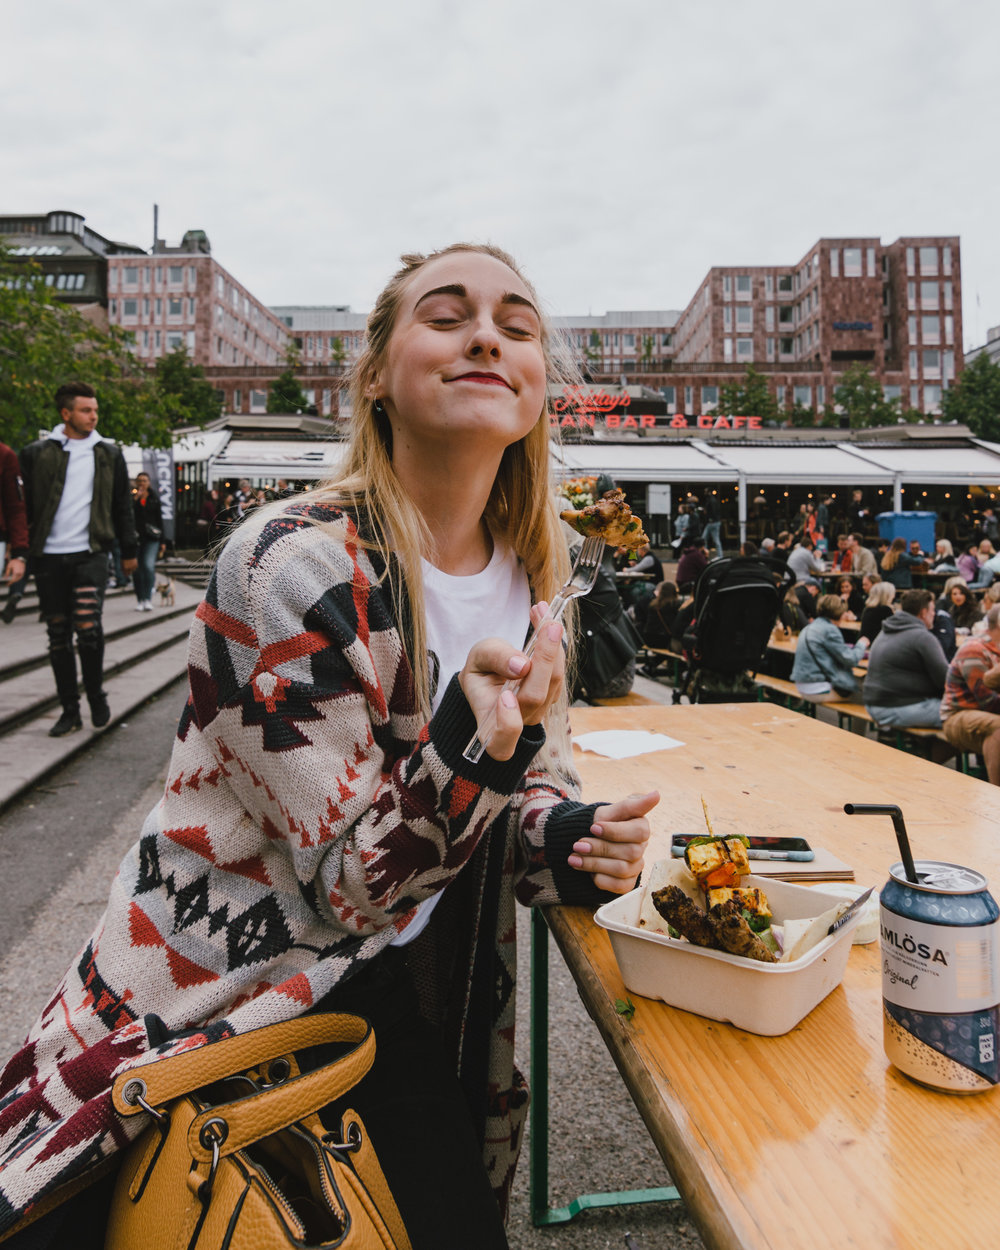 sthlm+street+food+matfestival